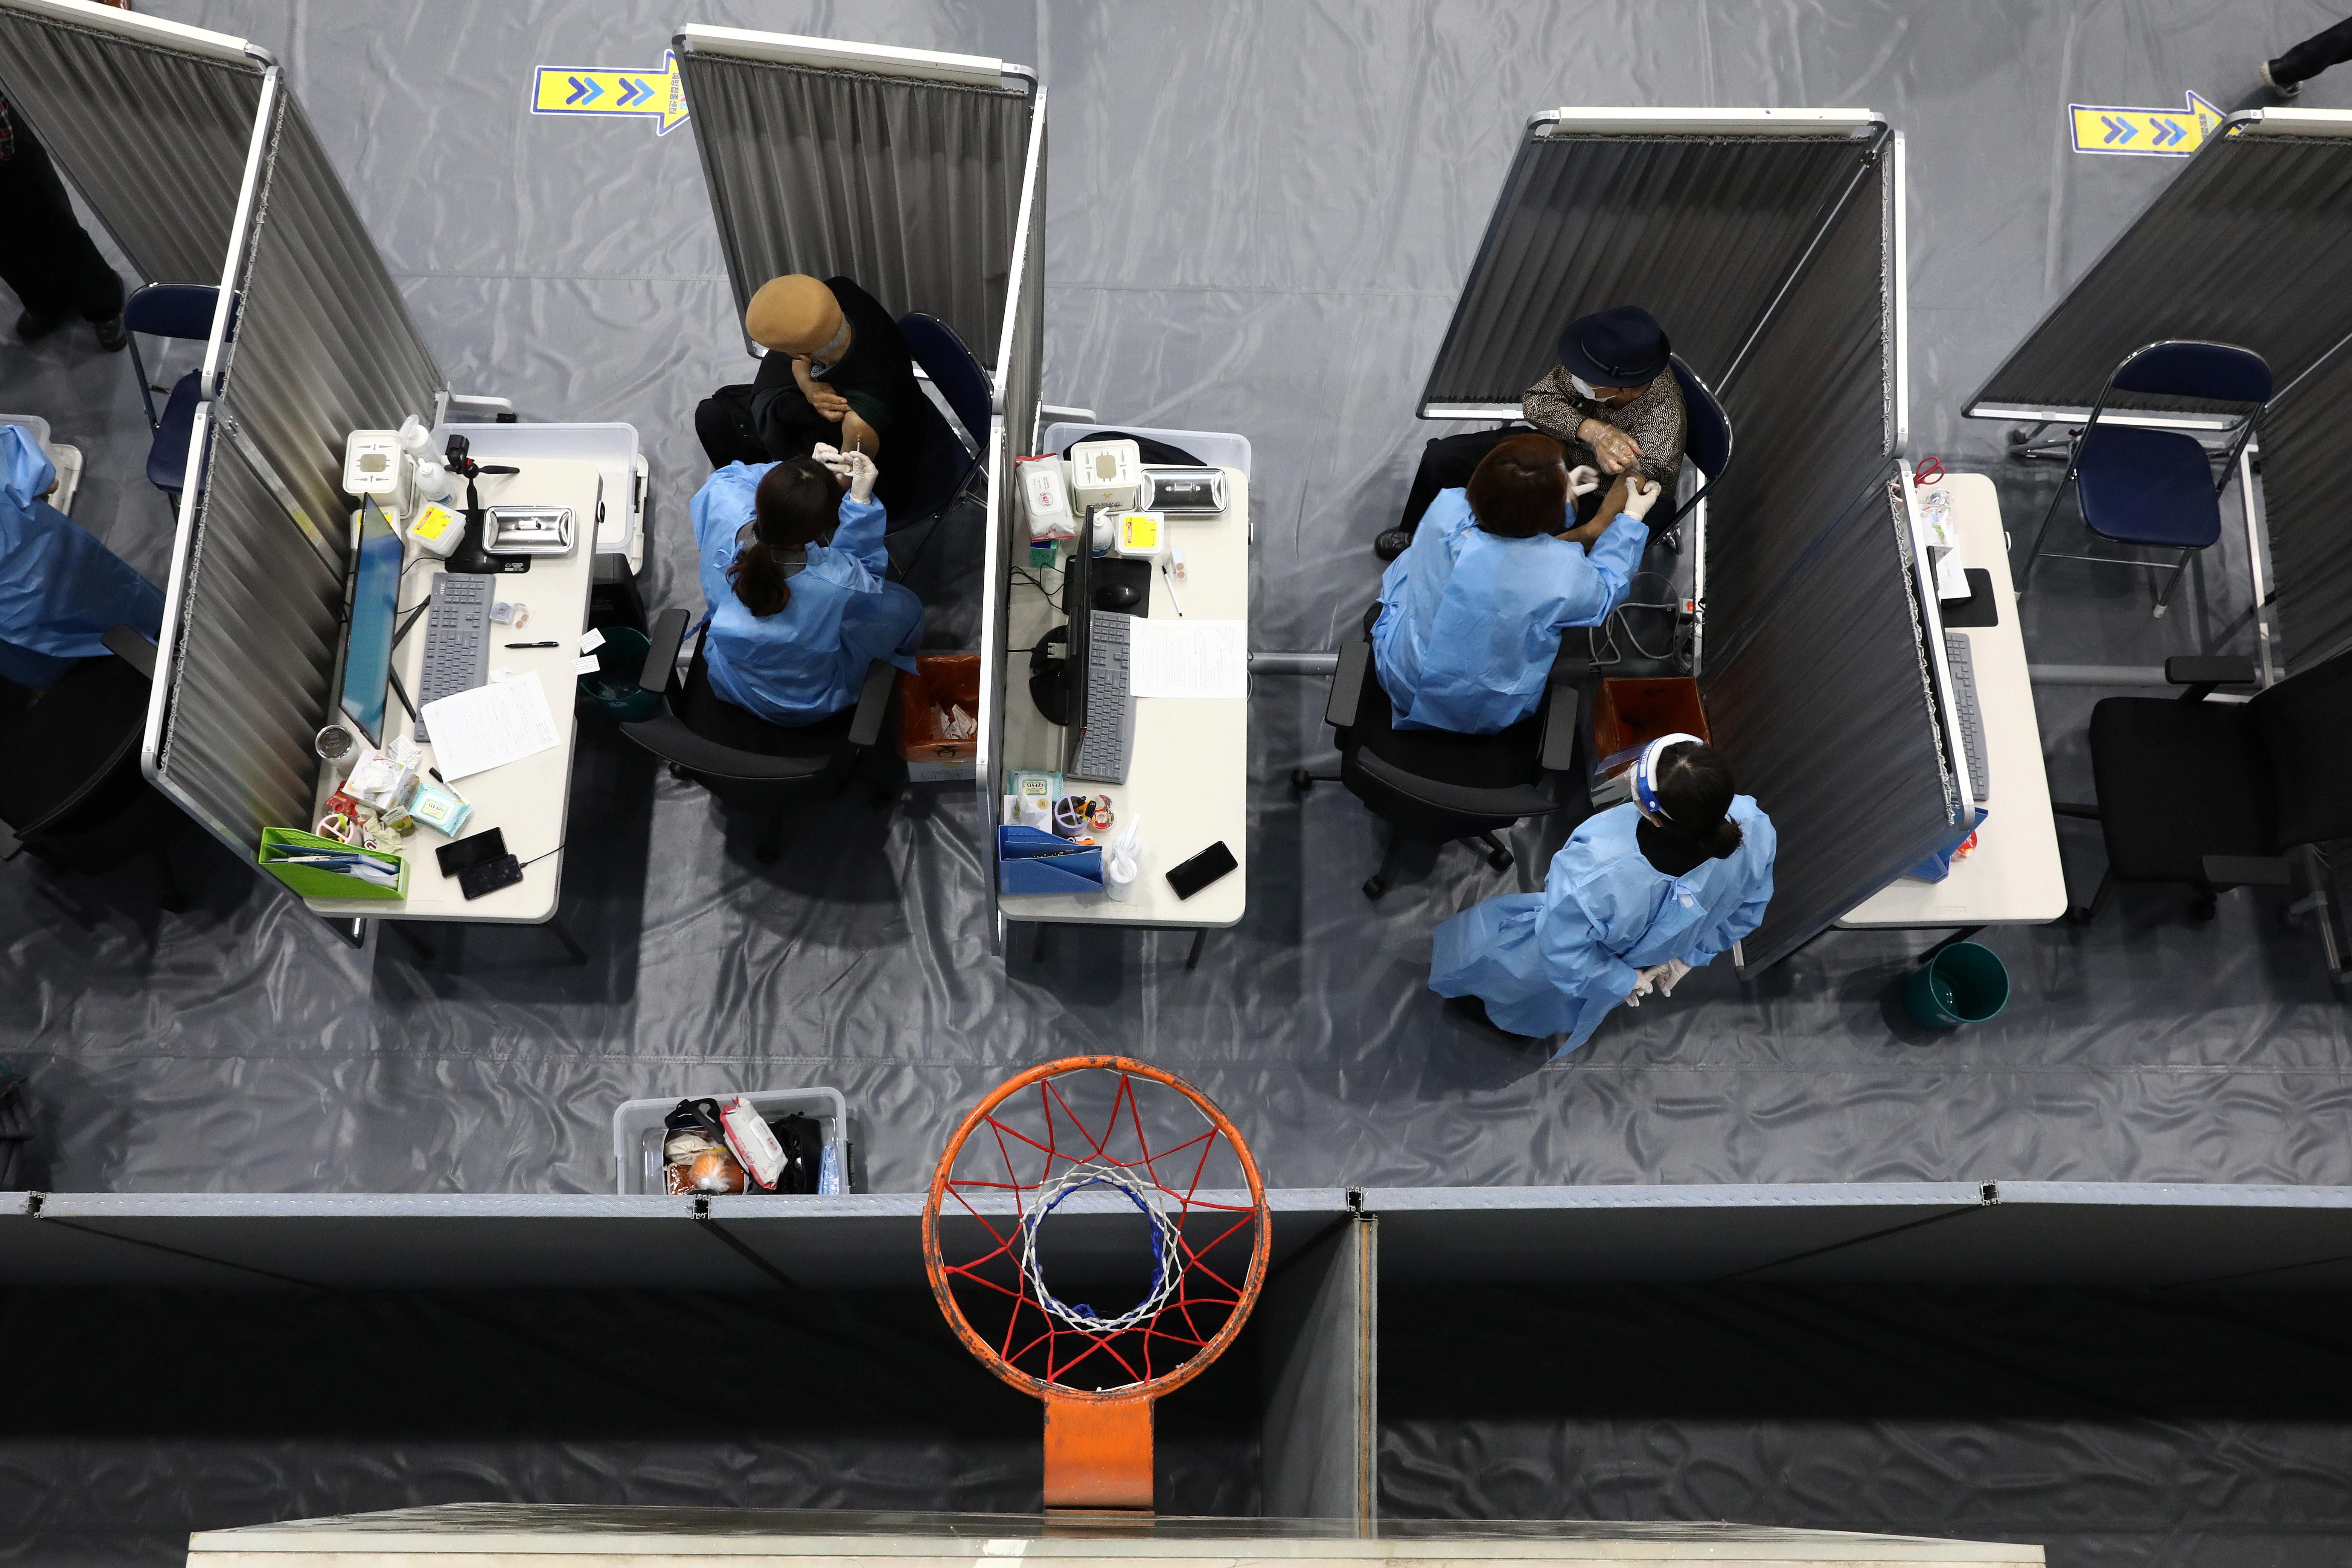 South Korean senior citizens receive their first dose of the Pfizer-BioNTech coronavirus disease (COVID-19) vaccine at a vaccination centre in Seoul, South Korea April 1, 2021. Chung Sung-Jun/Pool via REUTERS